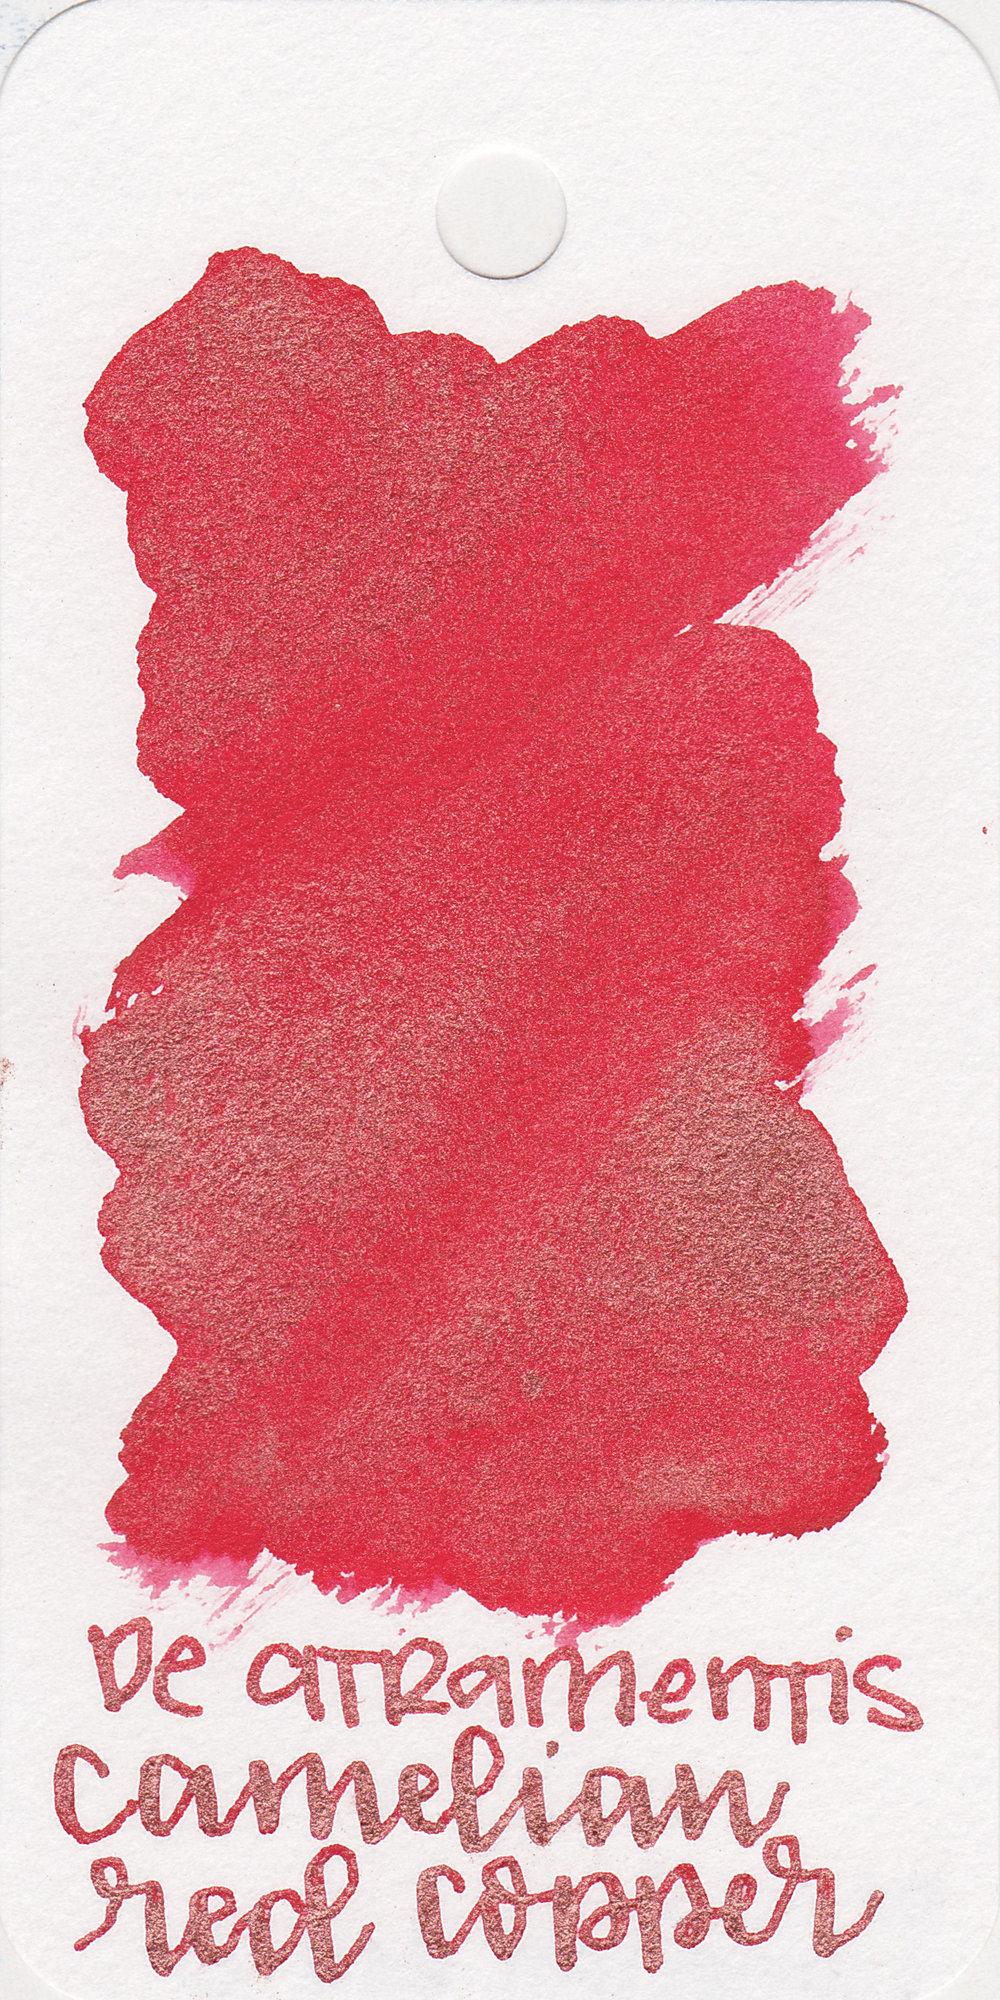 da-camelian-red-4.jpg